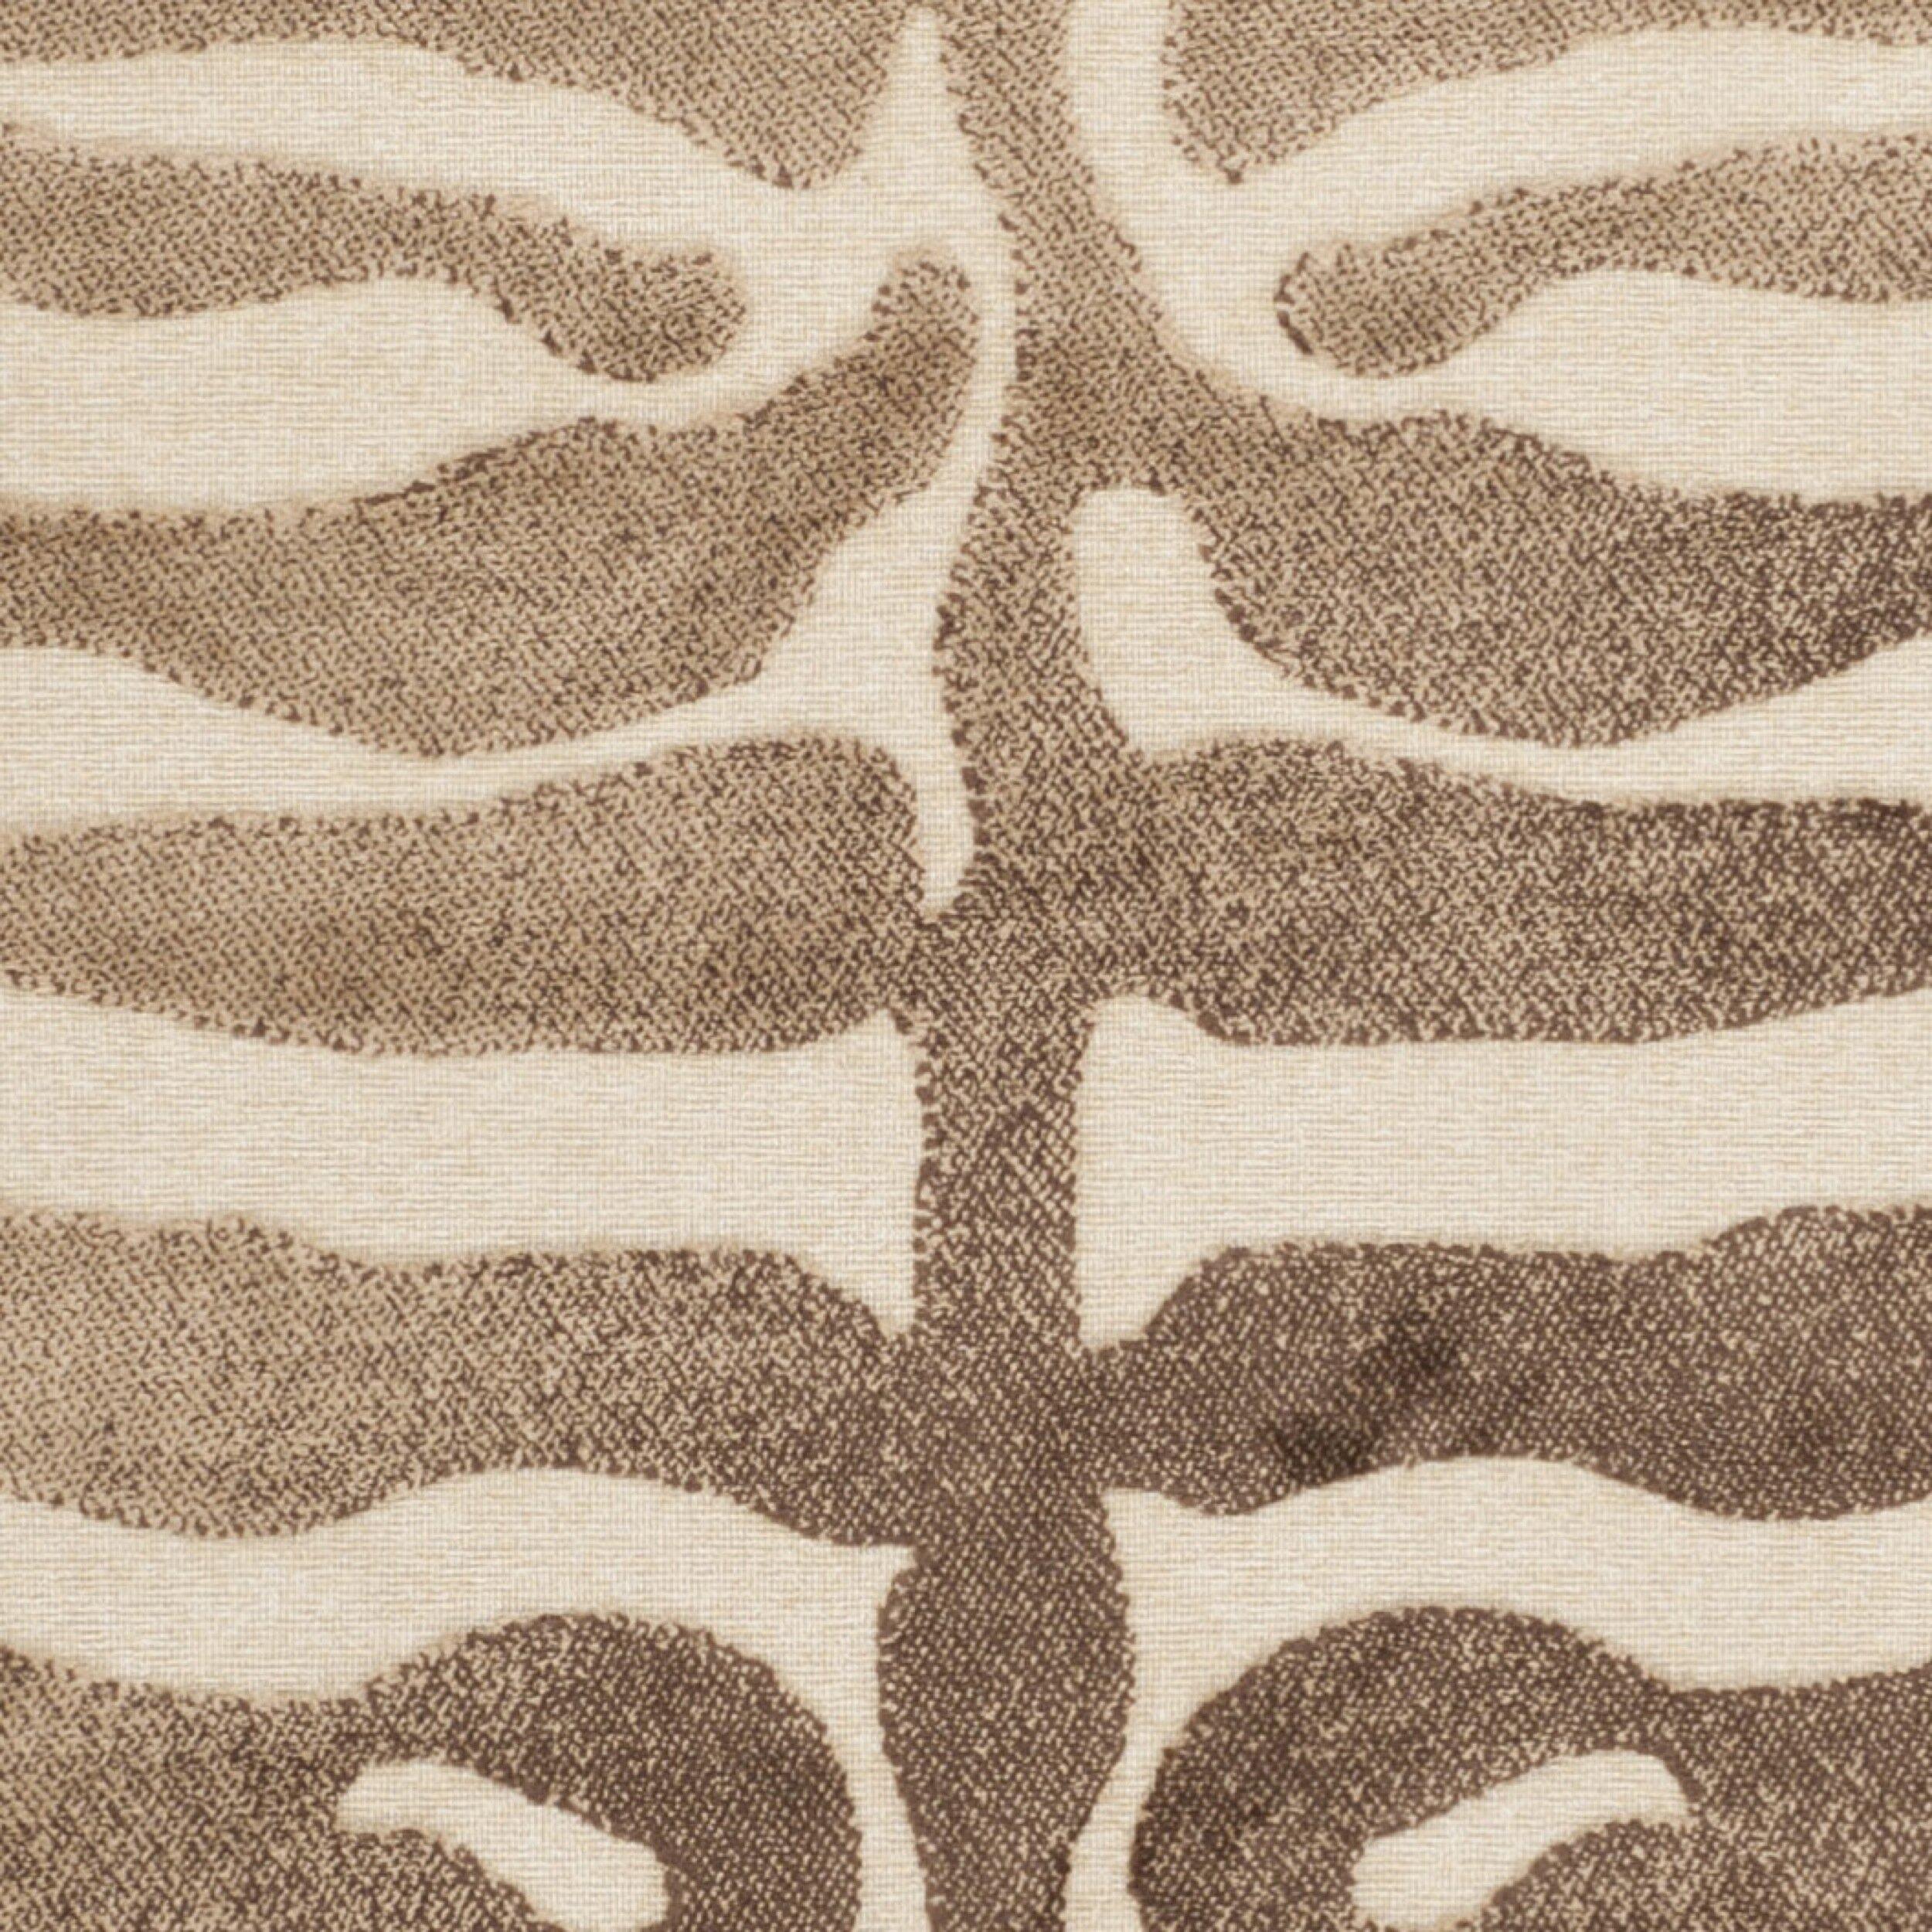 Zebra Rug Wayfair: Safavieh Paradise Zebra Brown Area Rug & Reviews